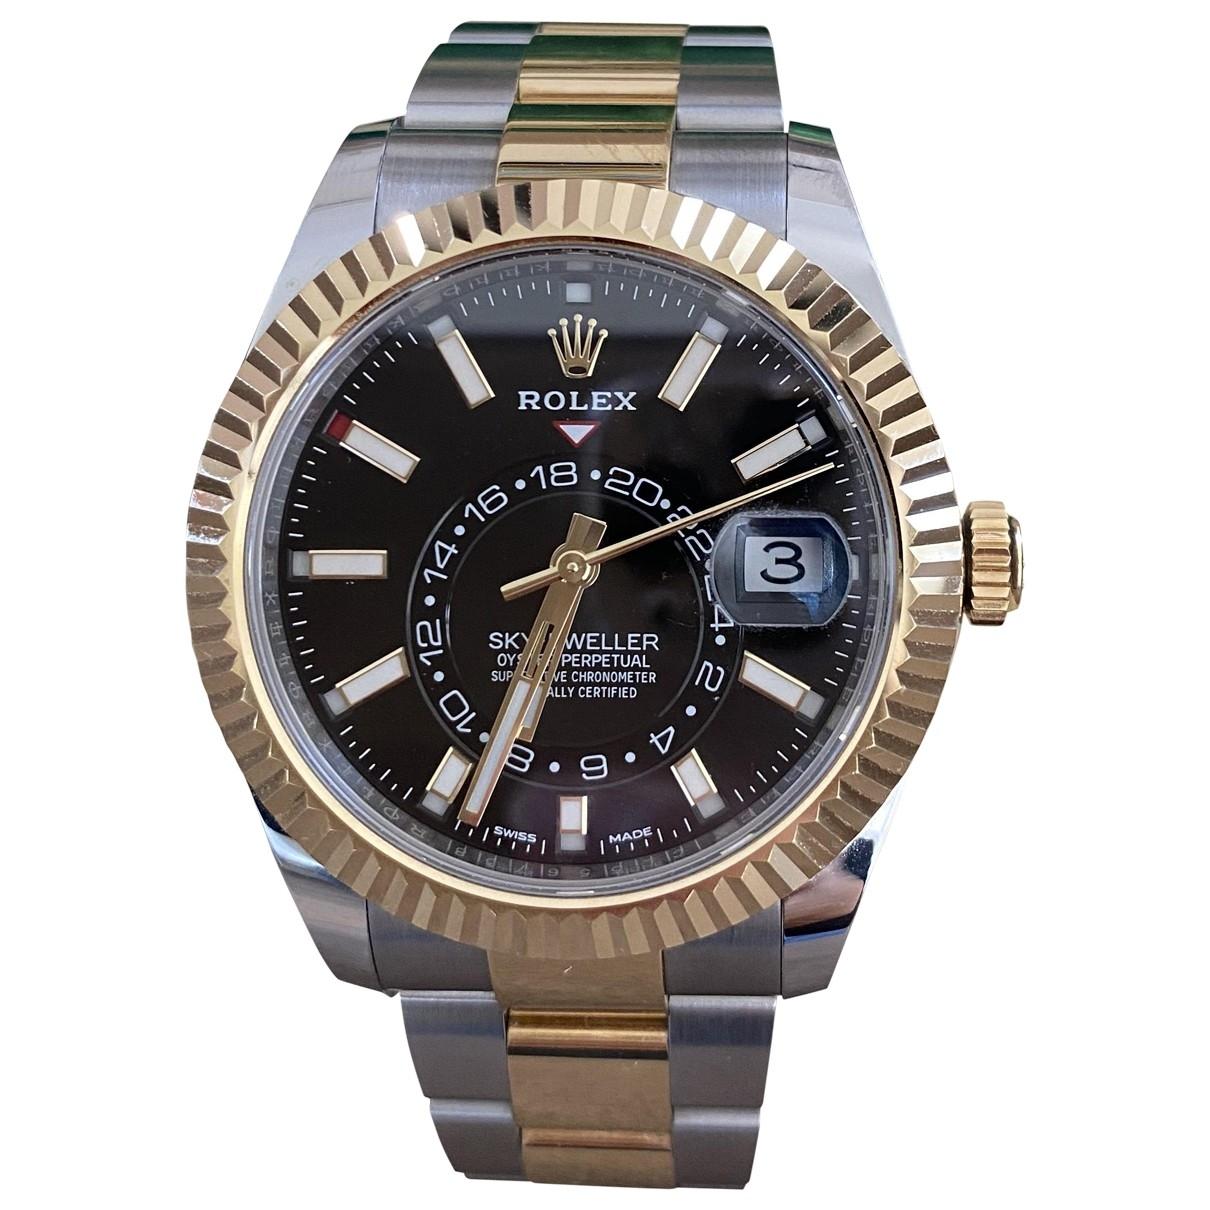 Relojes Sky-Dweller Rolex